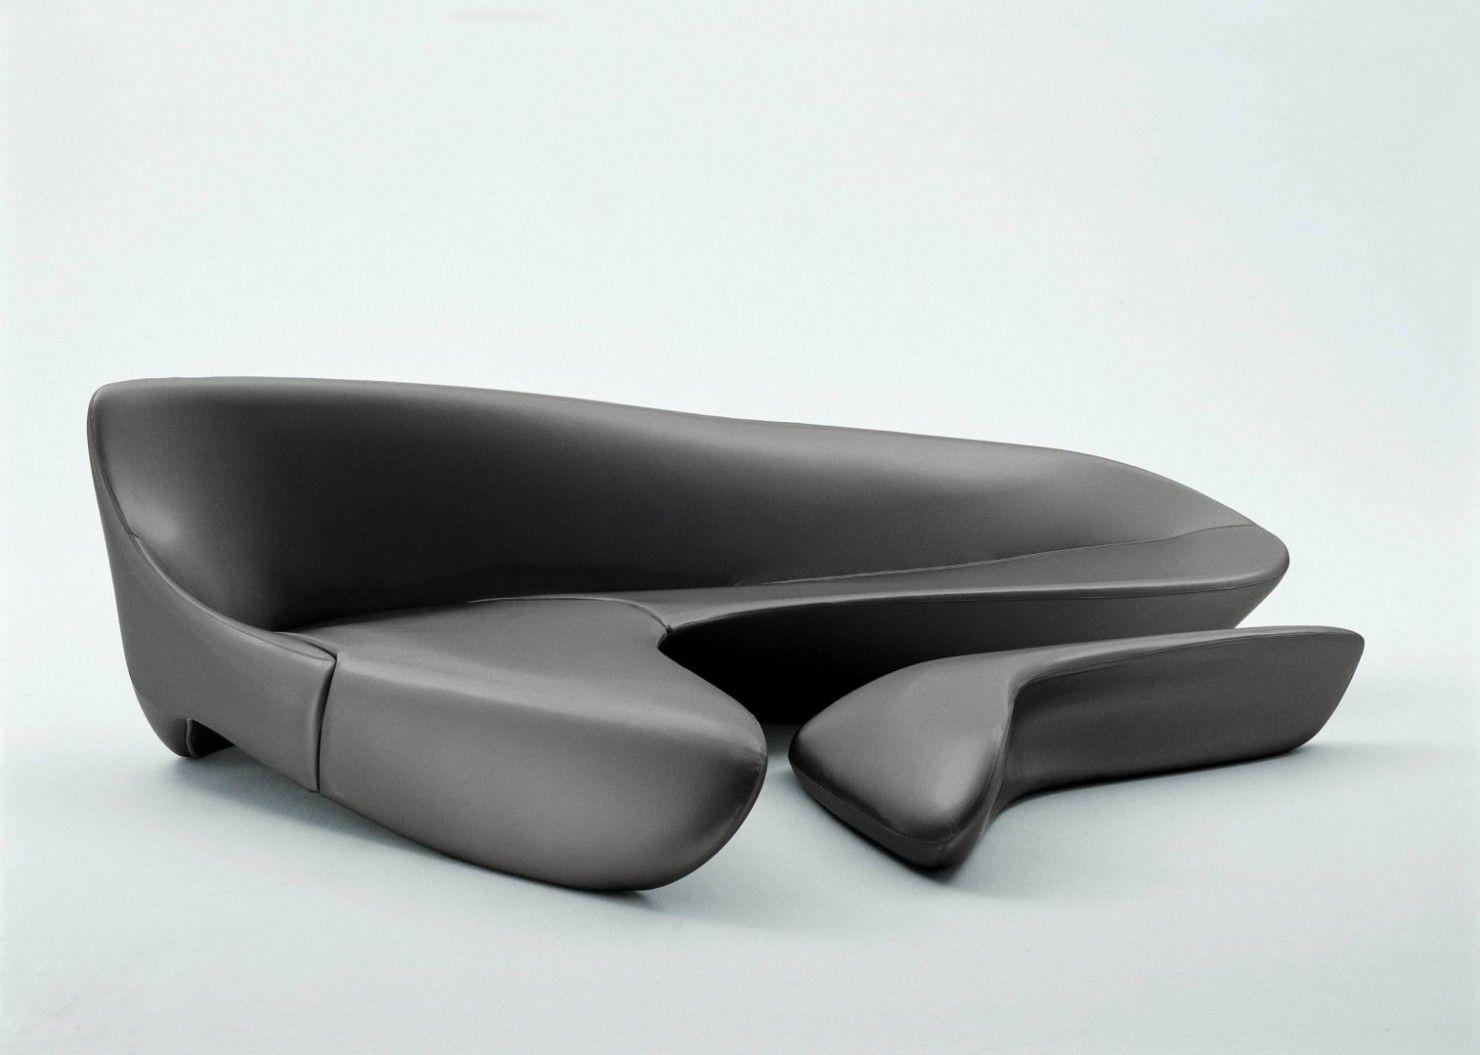 Contemporary Furniture Designs Ideas Living room furniture